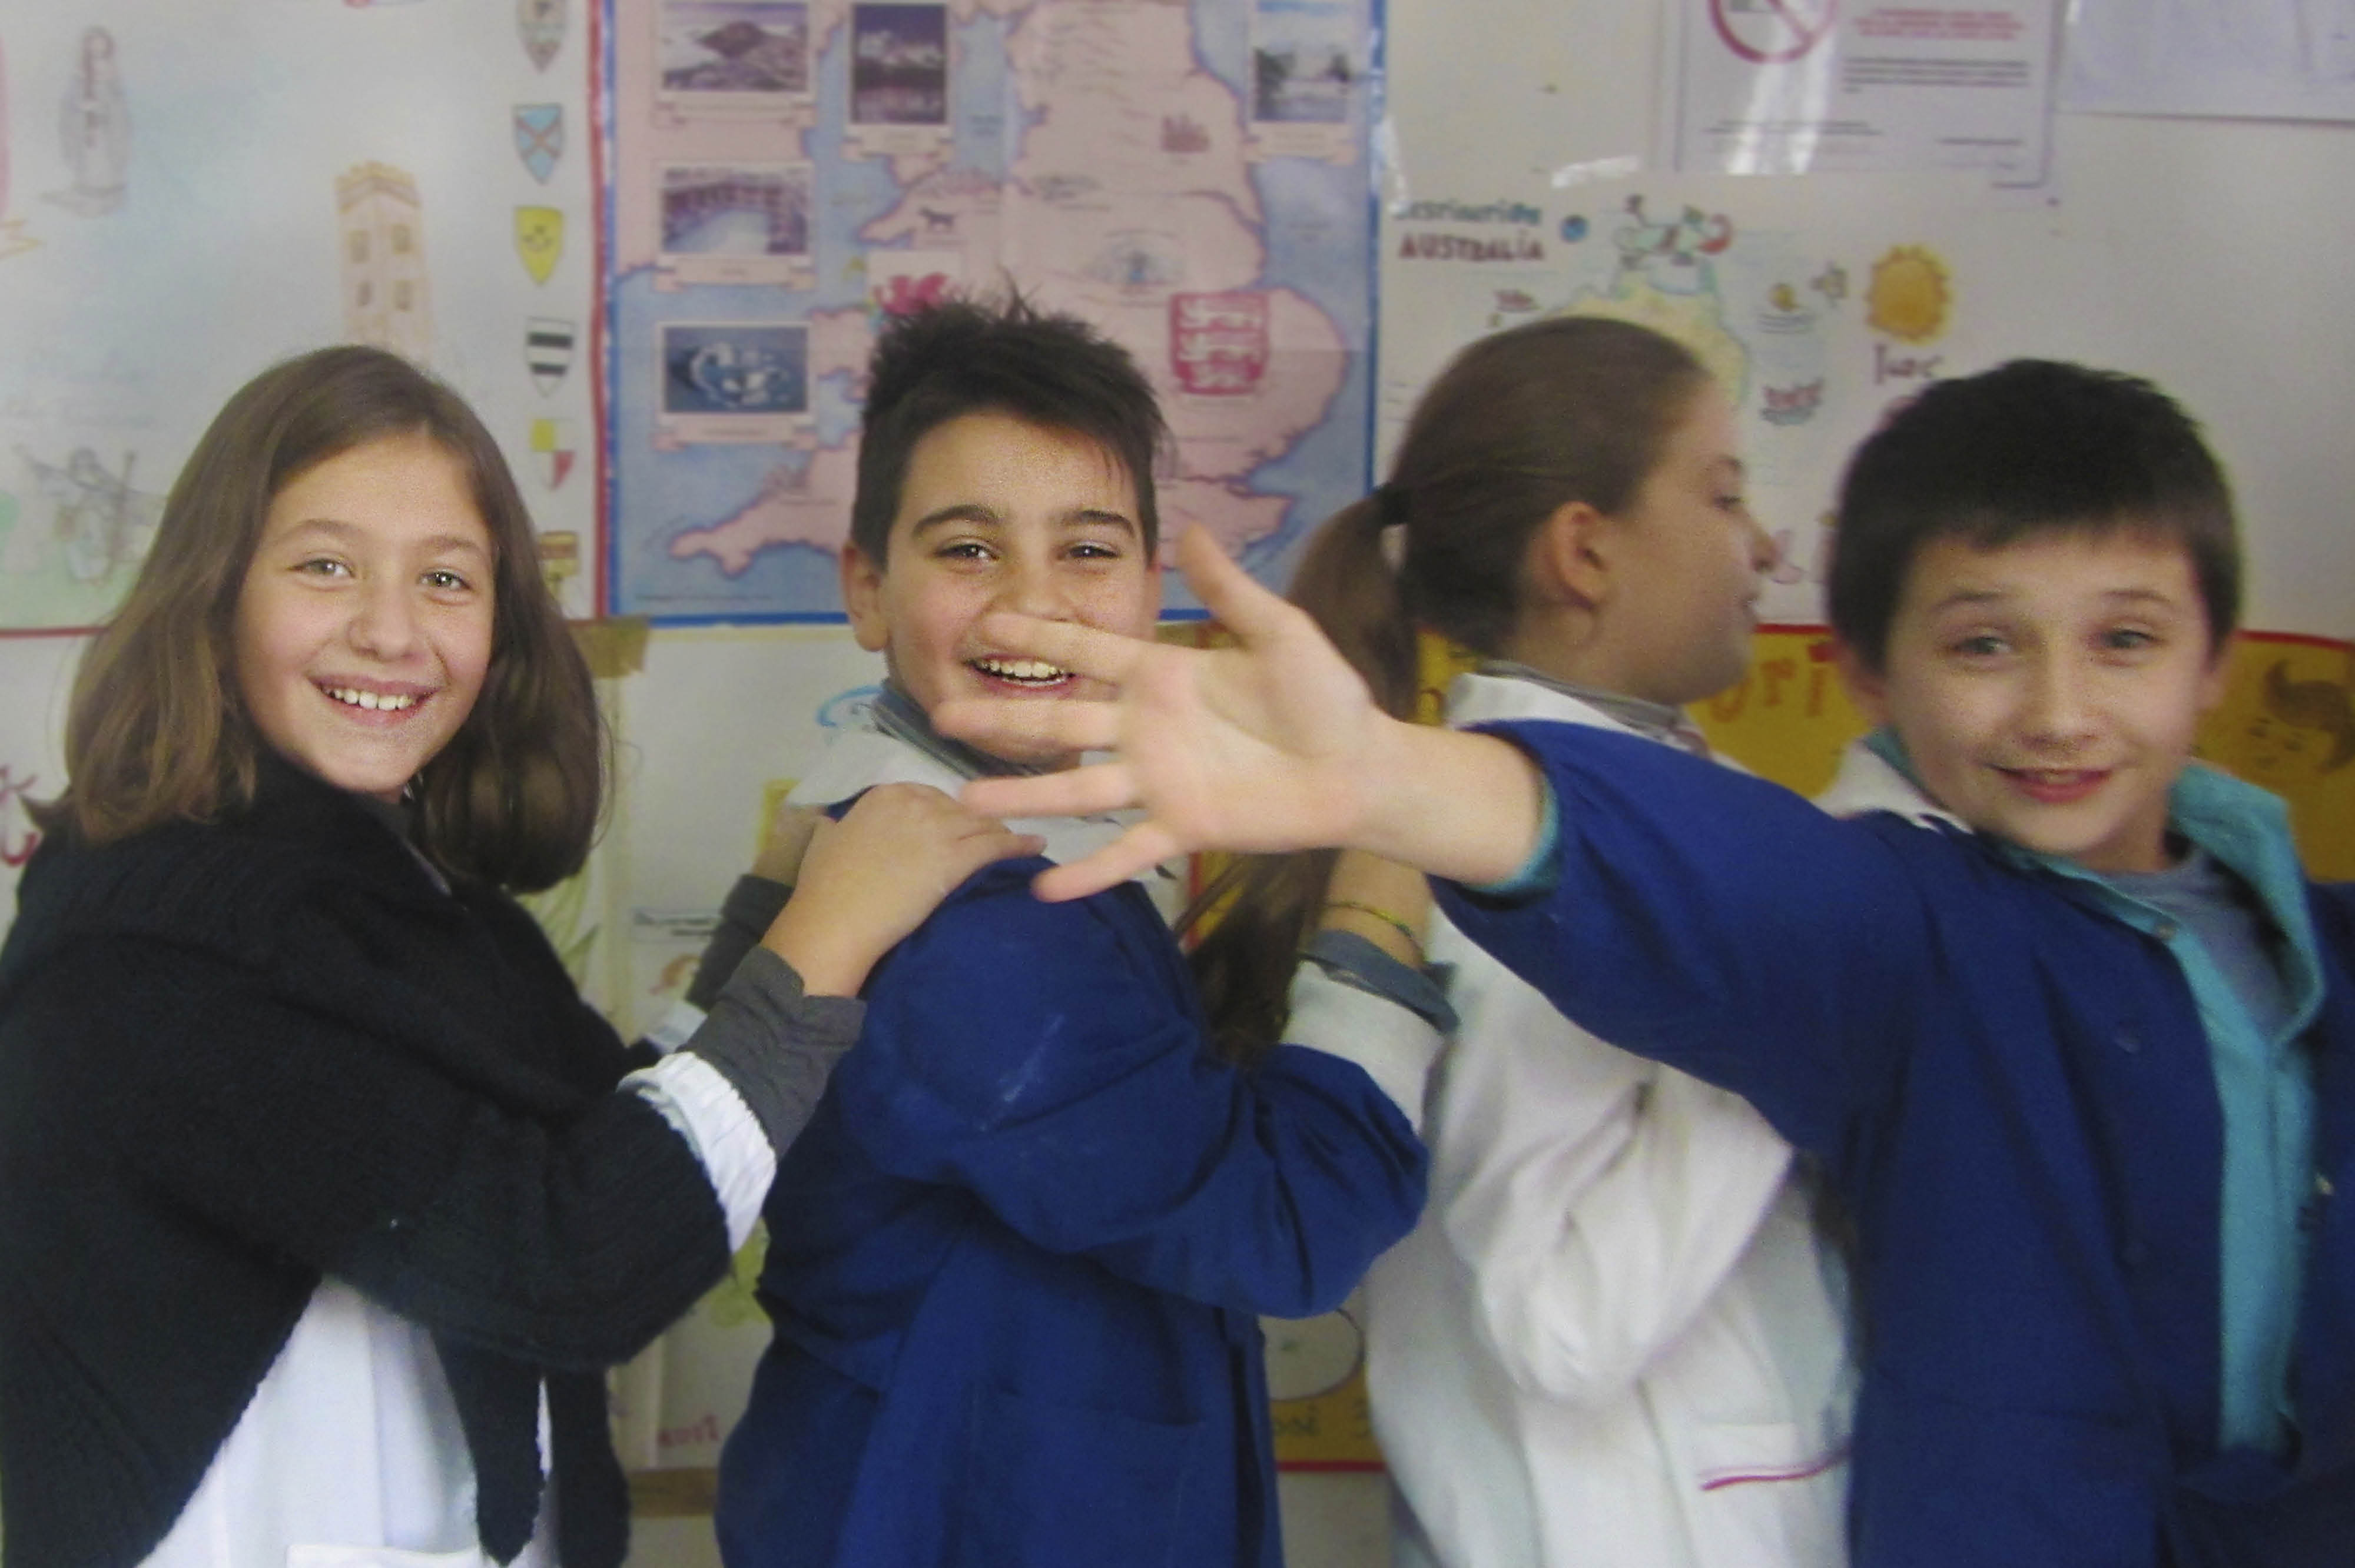 Benedict School Pomigliano d'Arco @ Somma29